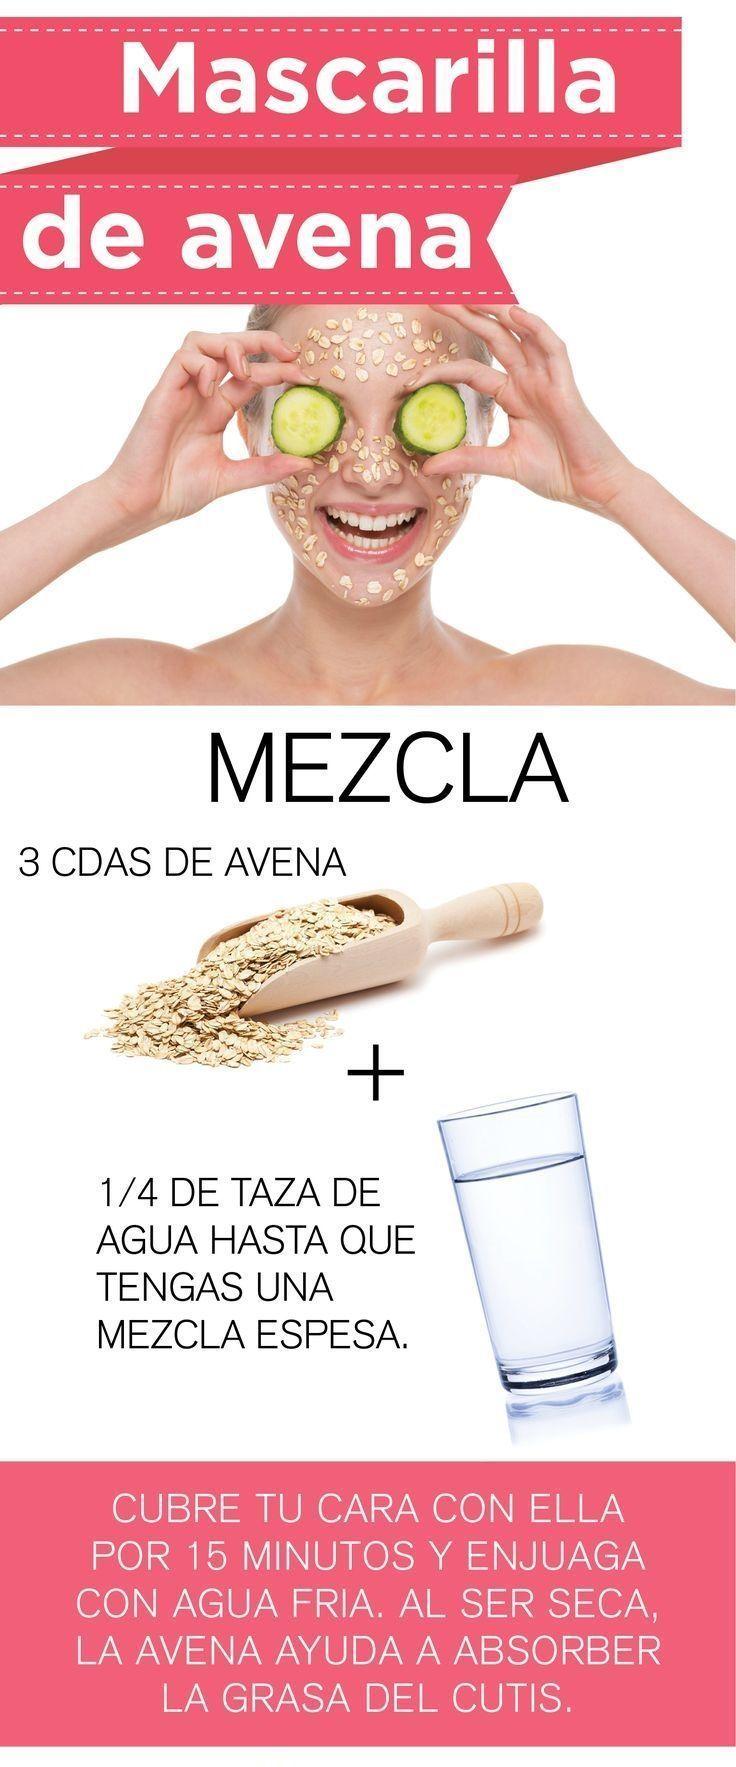 Beauty Skin Skin Mask Healthy Skin Cream Skin Care Beauty Remedies Acne Mascarillas Caseras Para Acne Mascarillas Para Piel Grasosa Mascarillas Para Acne